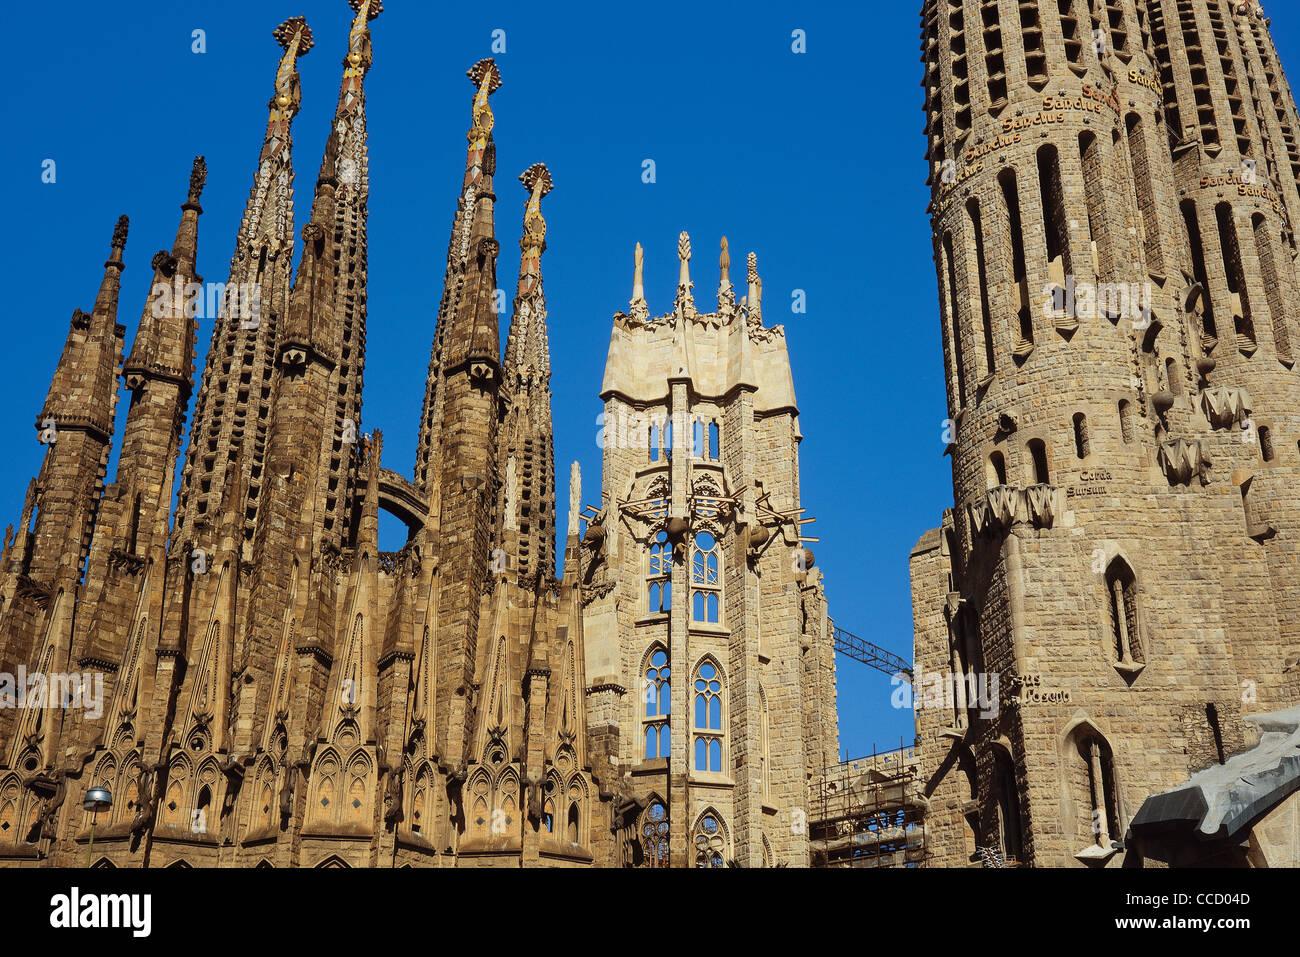 Spain. Catalonia. Barcelona. Antoni Gaudi  (1852-1926). Basilica and Expiatory Church of the Holy Family. Detail. - Stock Image